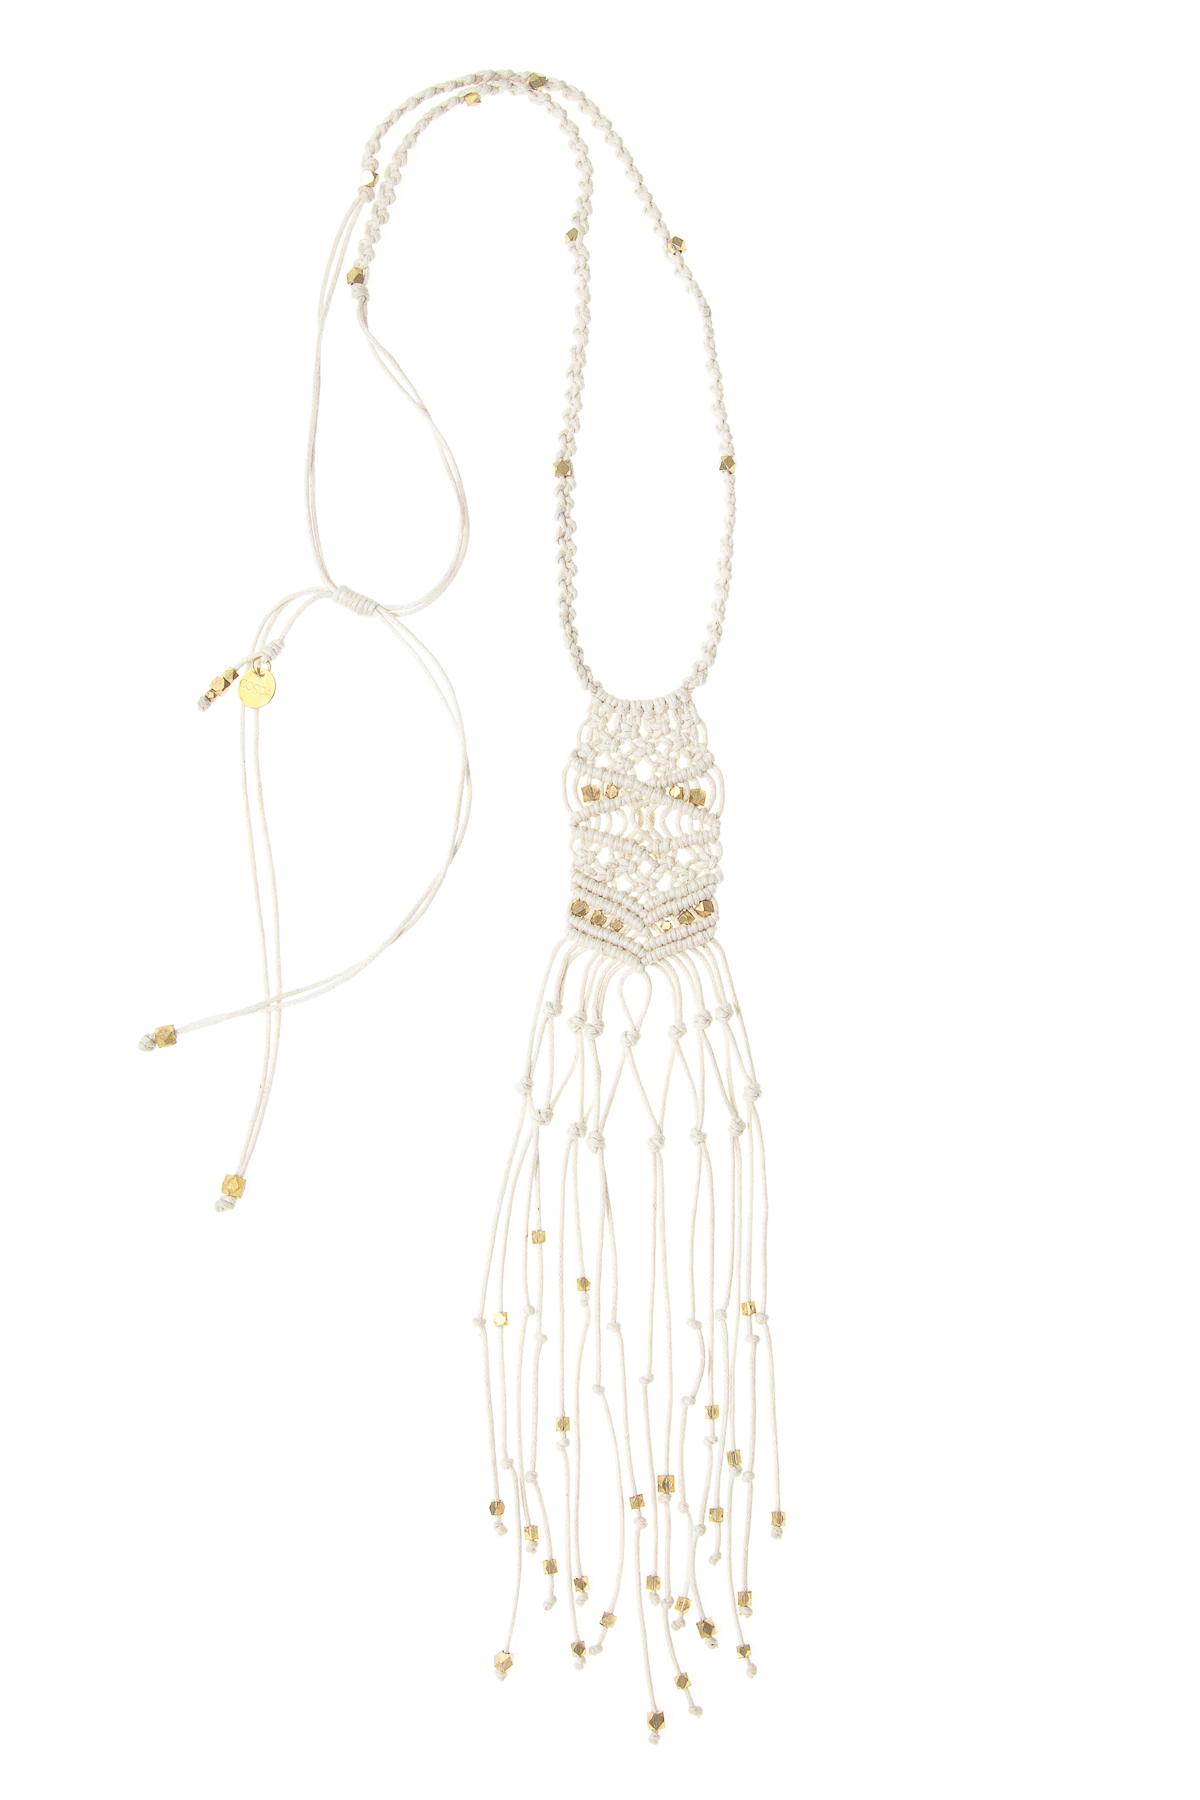 CORDA-MACRAME-Medium-Necklace-Ivory-Brass.jpg